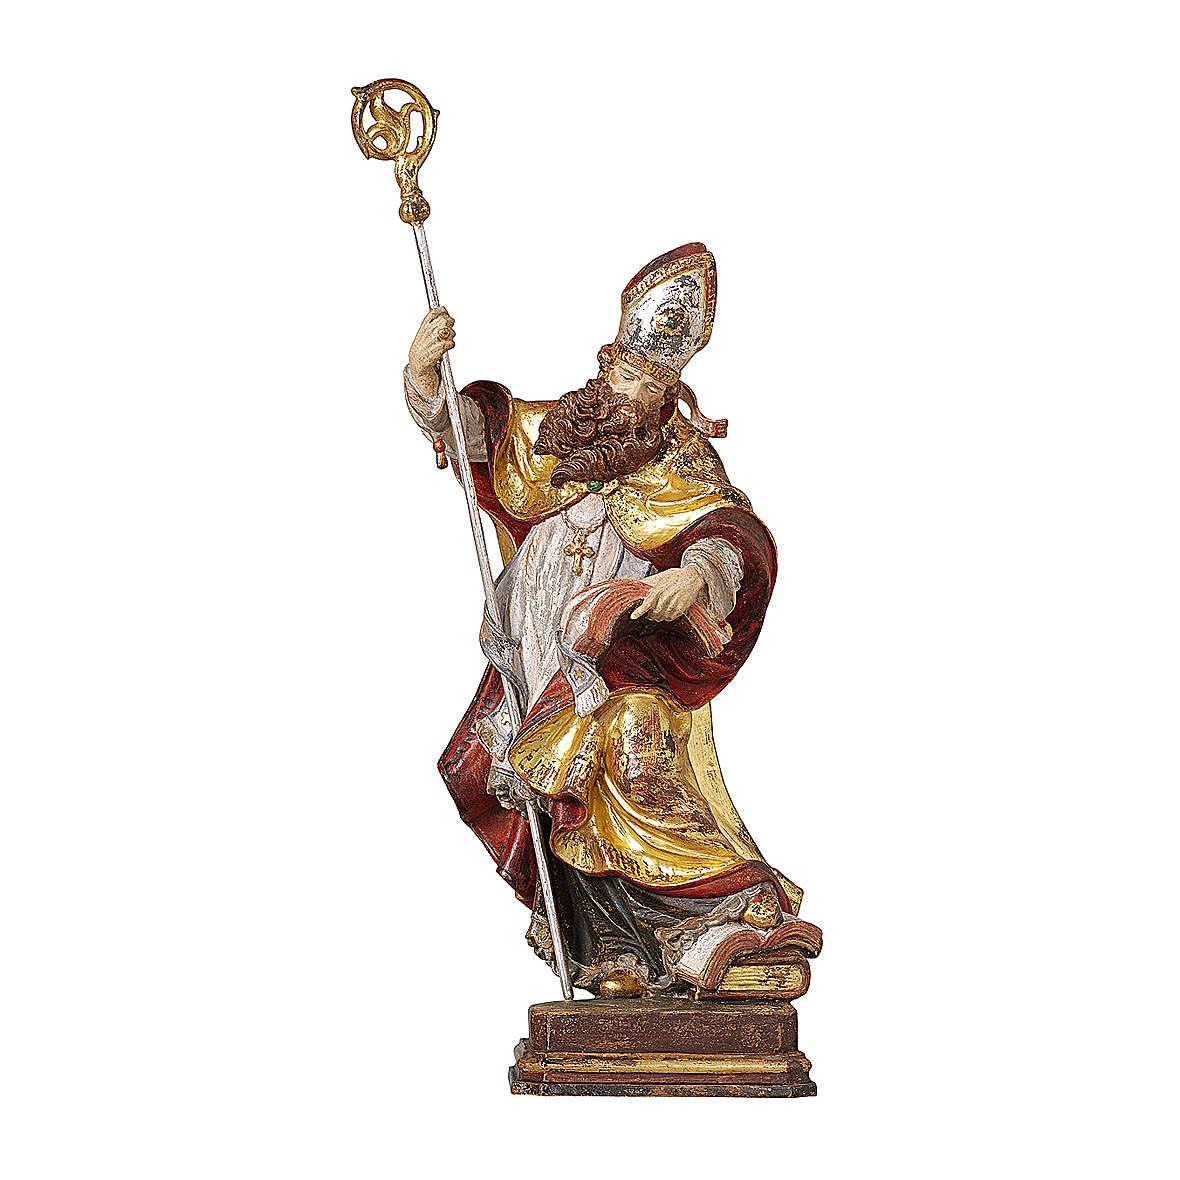 Vescovo legno manto oro zecchino Valgardena 4